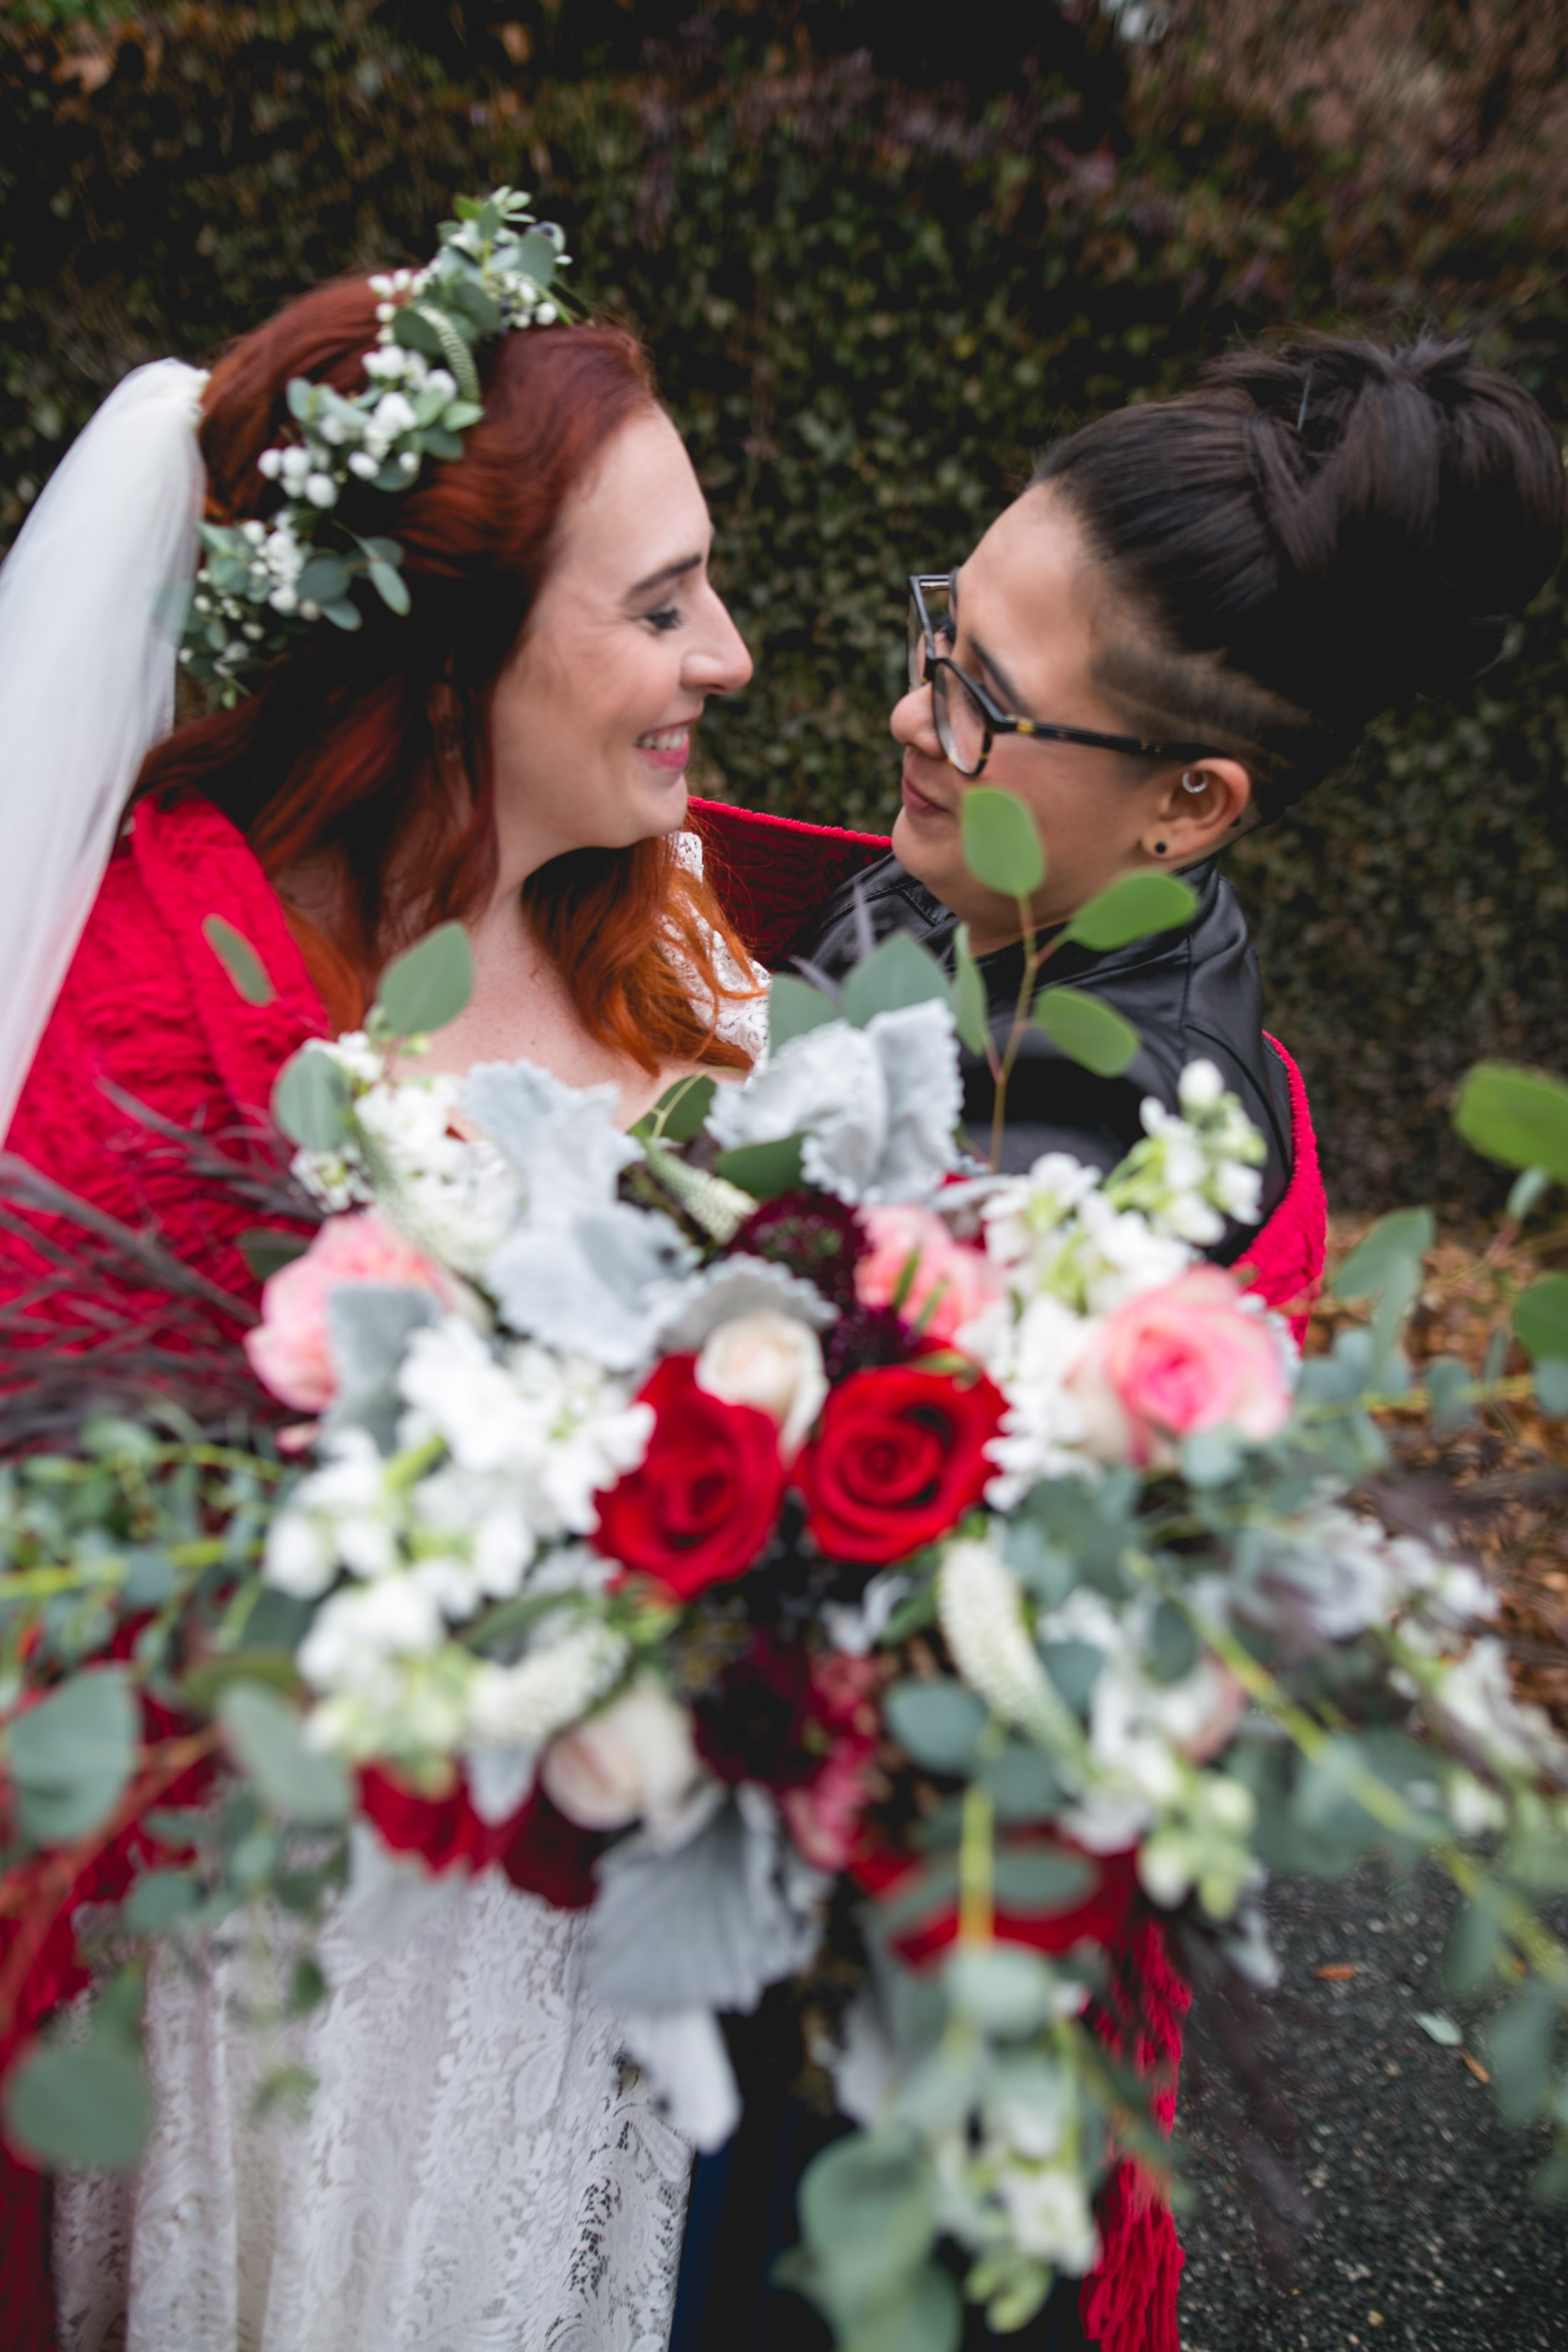 LGBTQ Philadelphia Wedding by Swiger Photography the Lesbian photographer 19